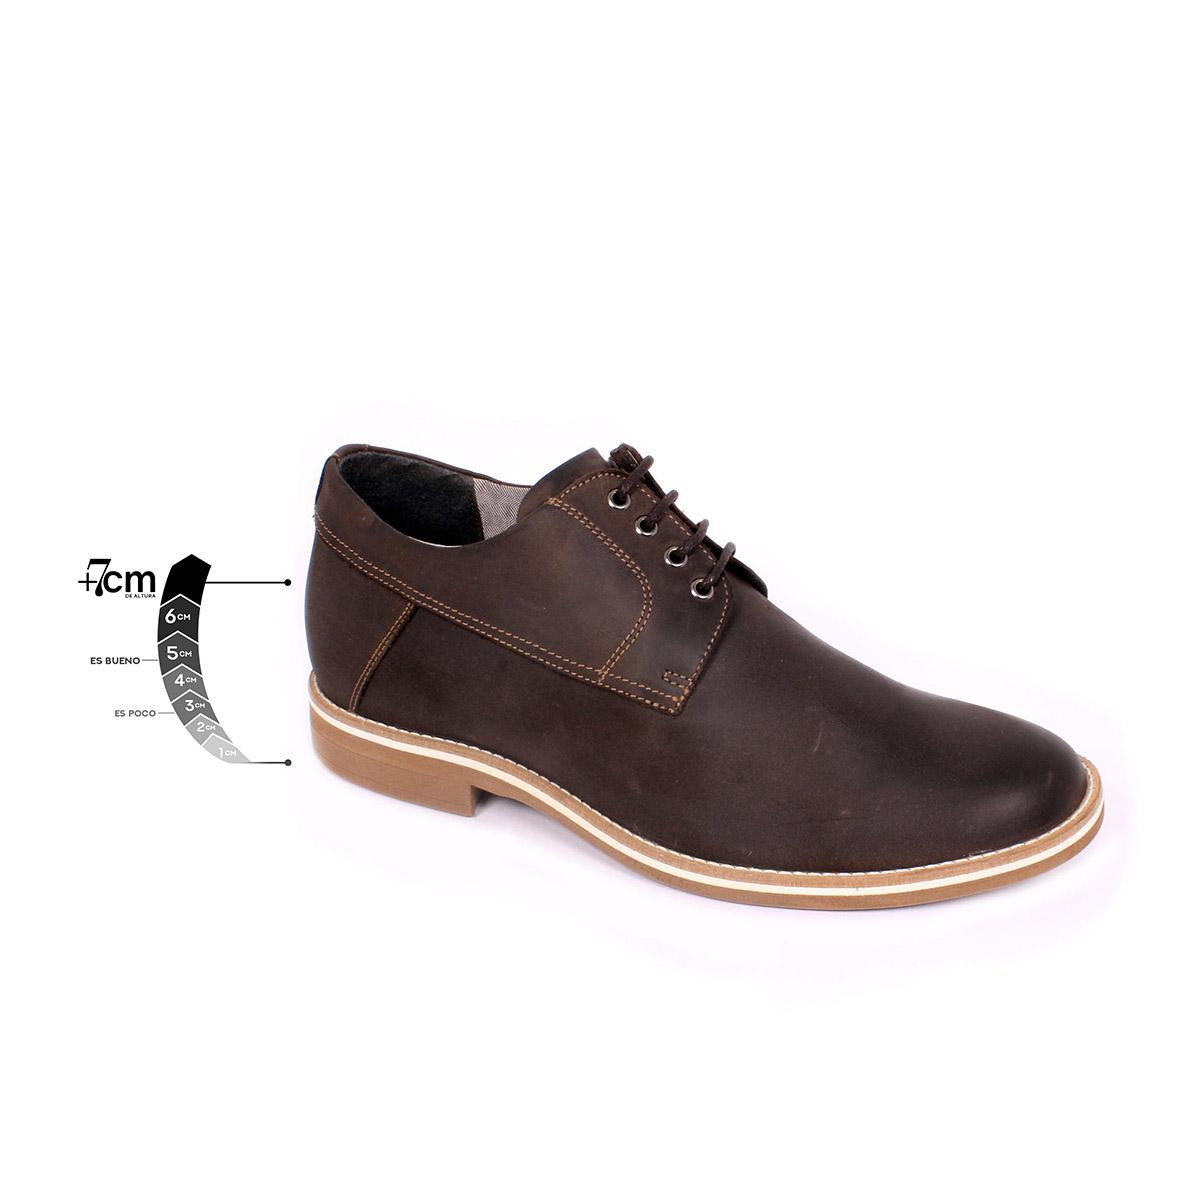 Zapato Casual Culture Café Max Denegri +7cms de Altura_75293